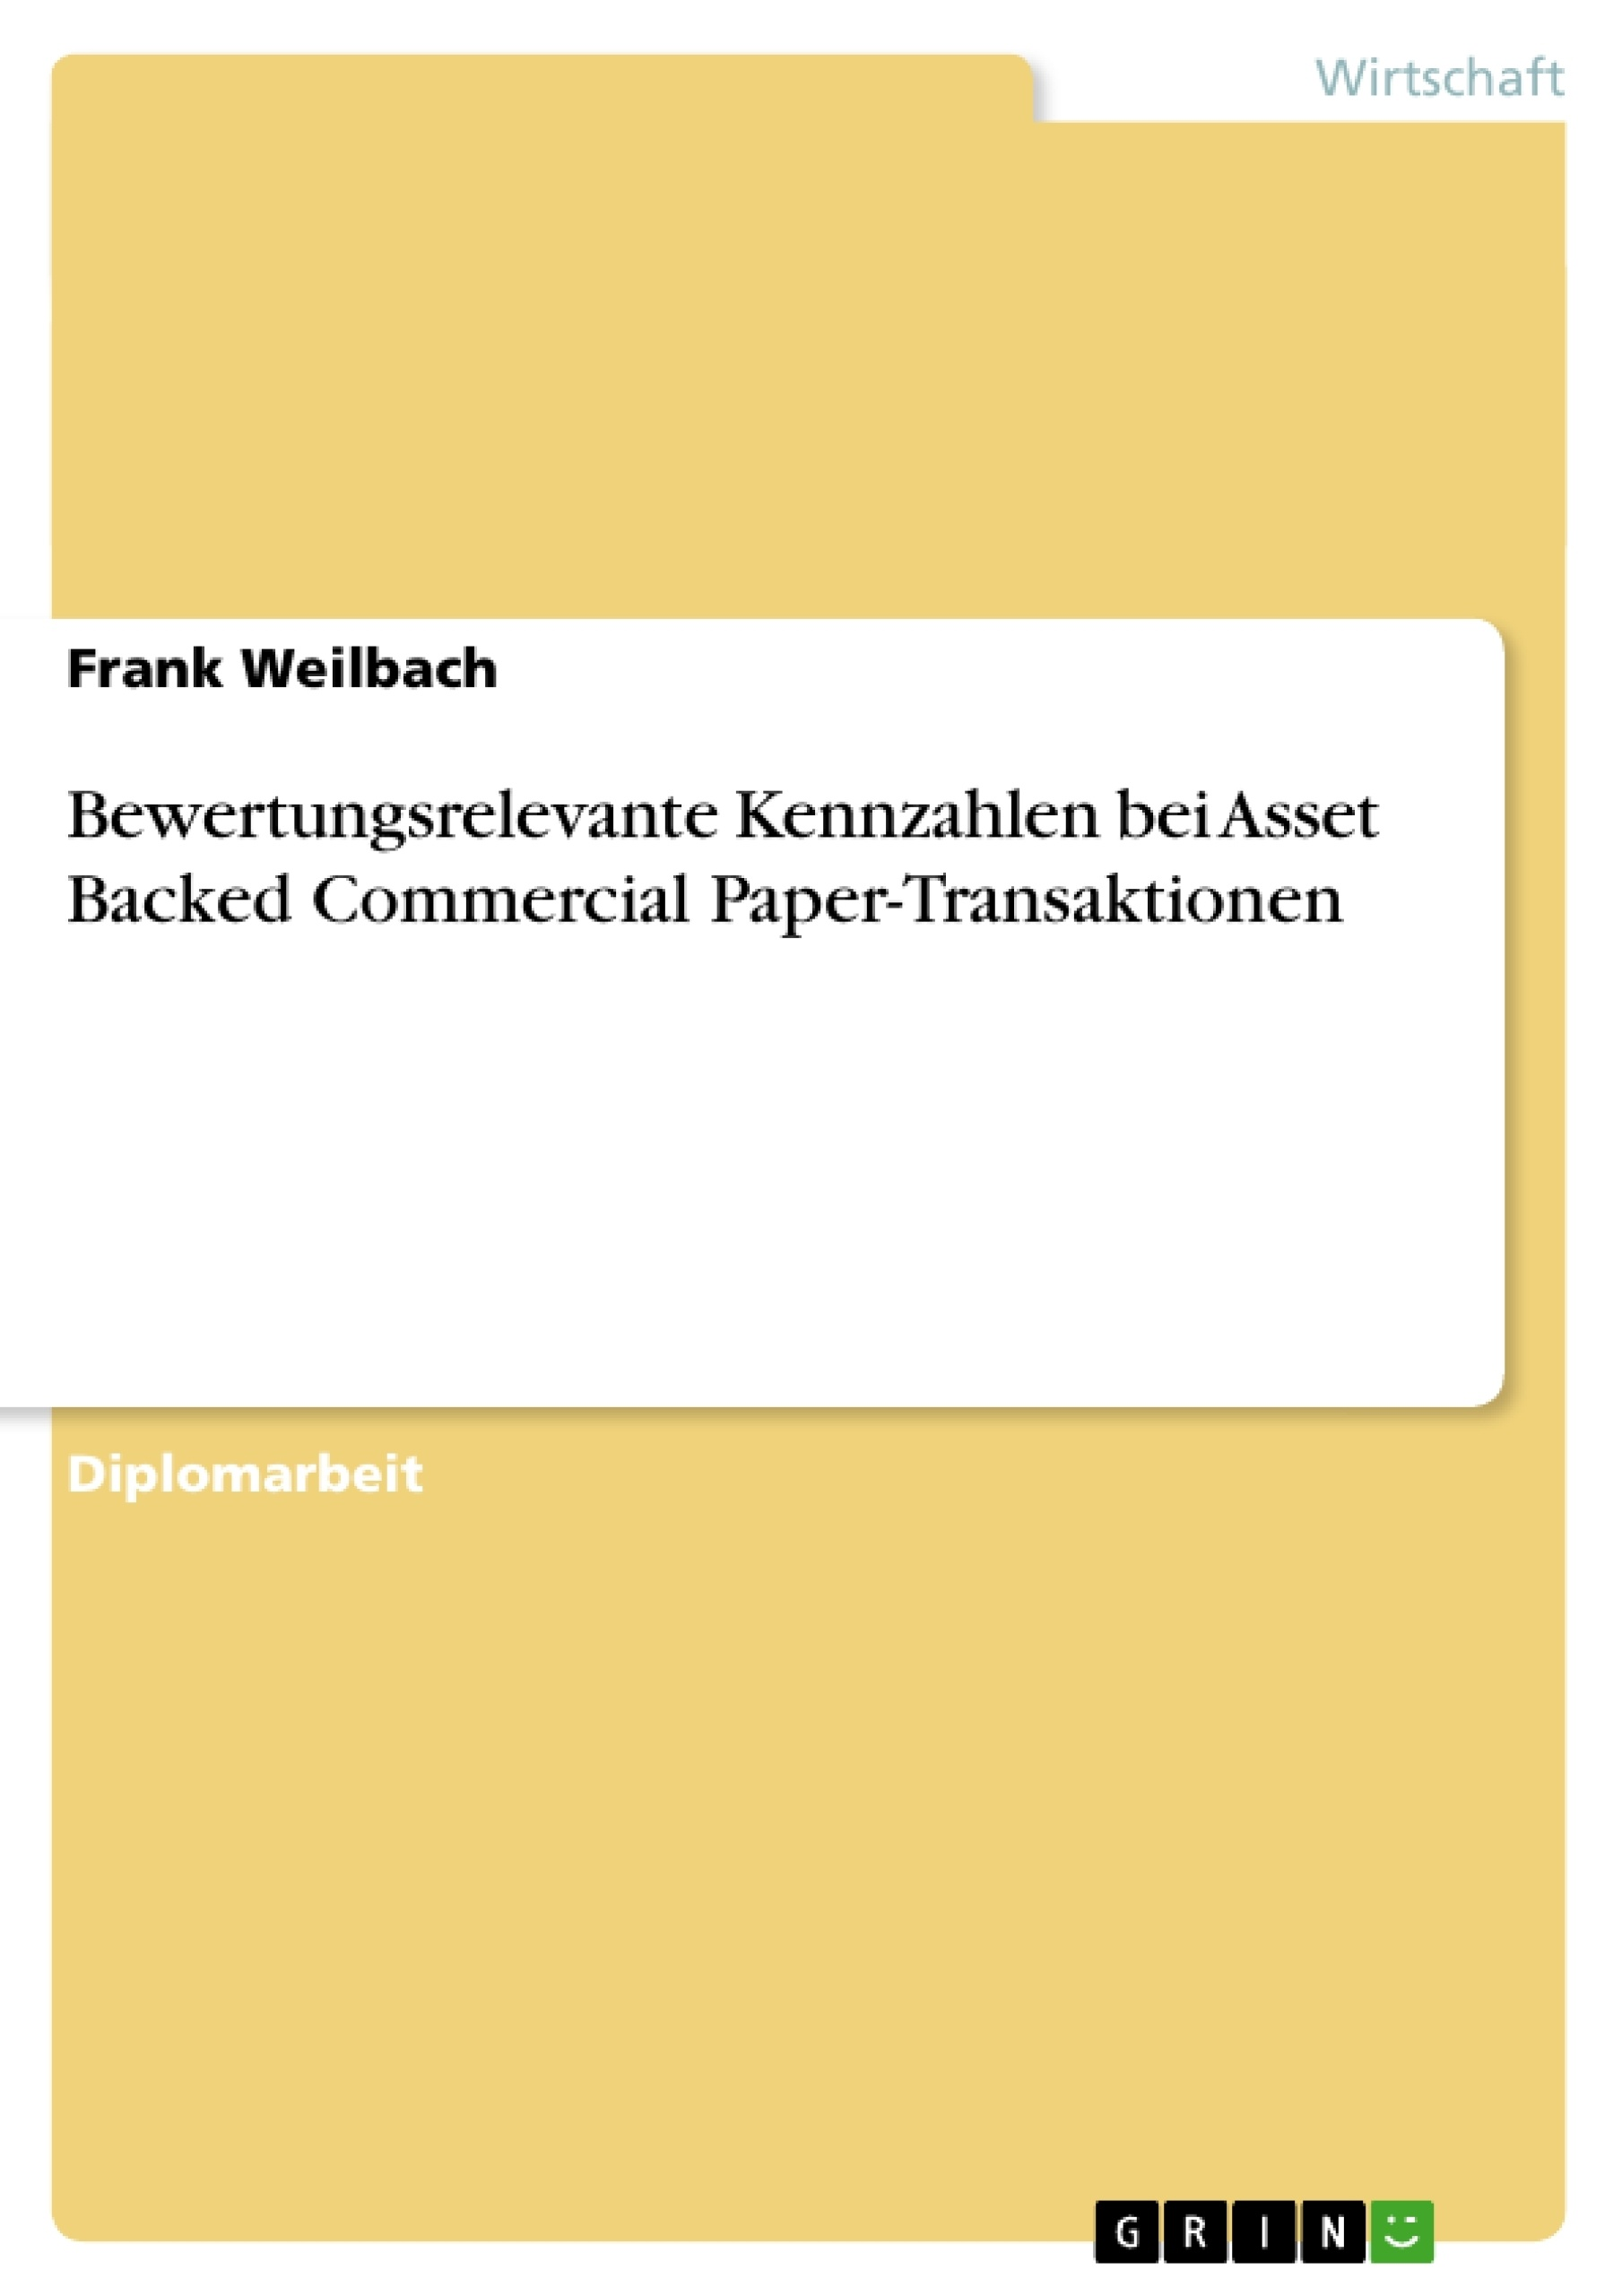 Titel: Bewertungsrelevante Kennzahlen bei Asset Backed Commercial Paper-Transaktionen